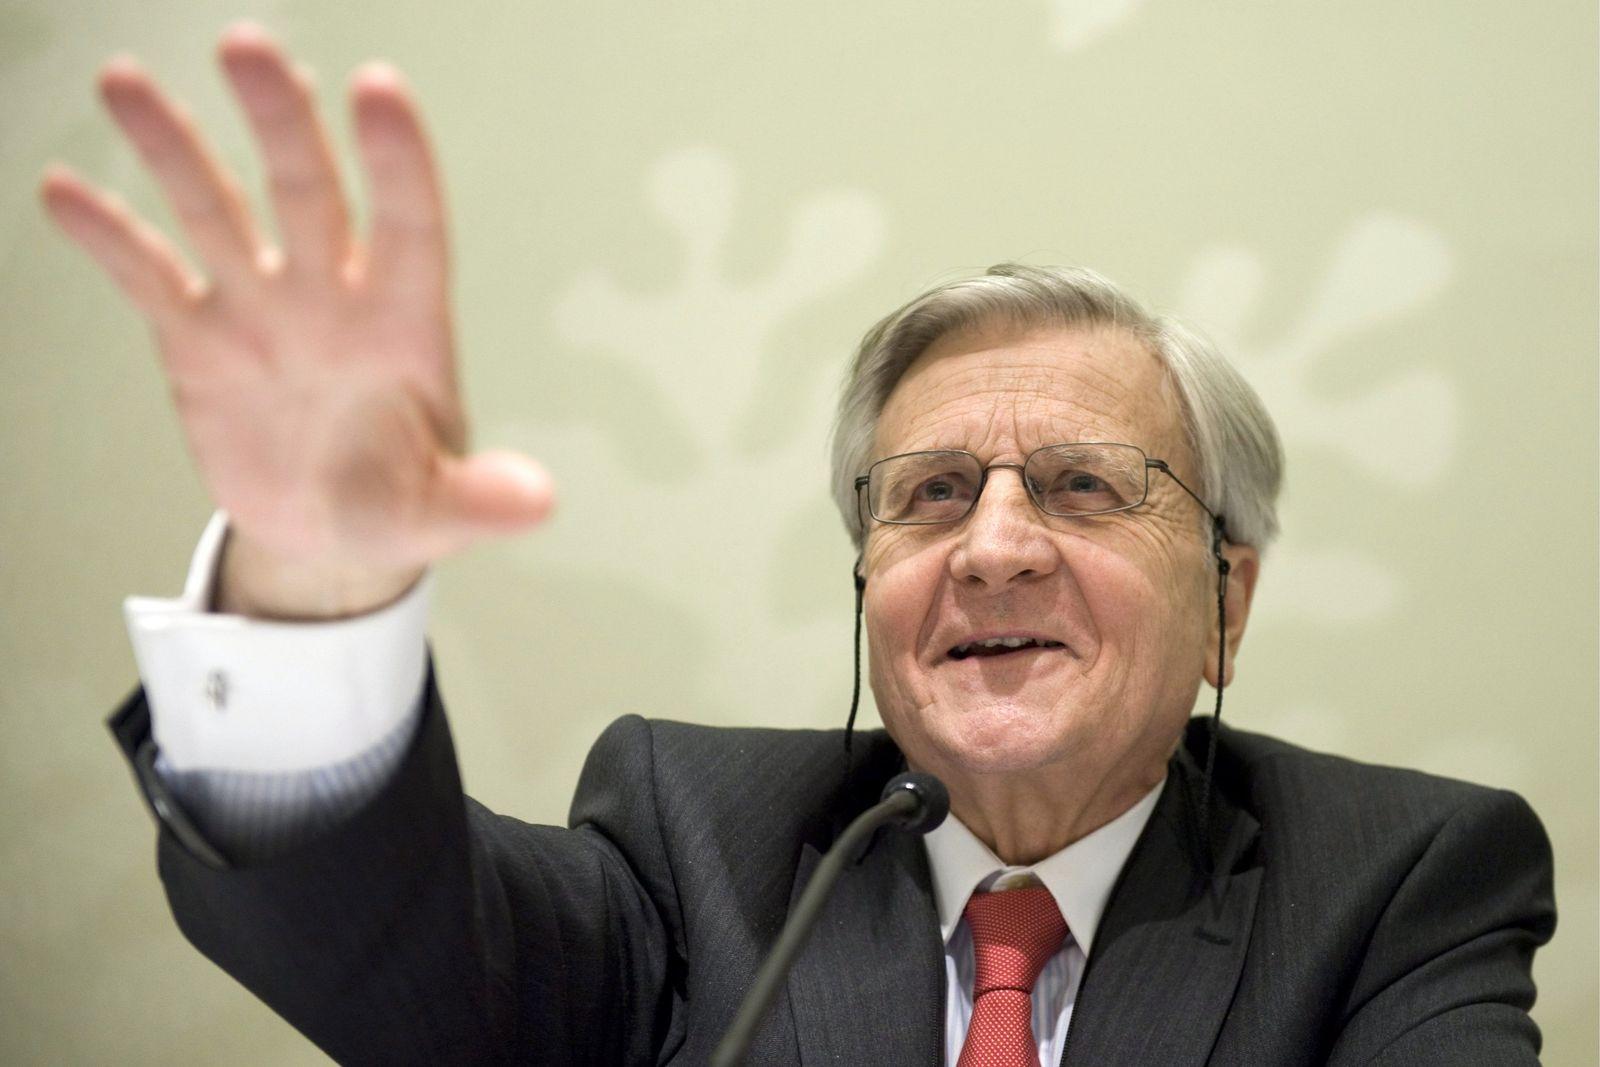 Jean-Claude Trichet, president of the European Central Bank ECB,